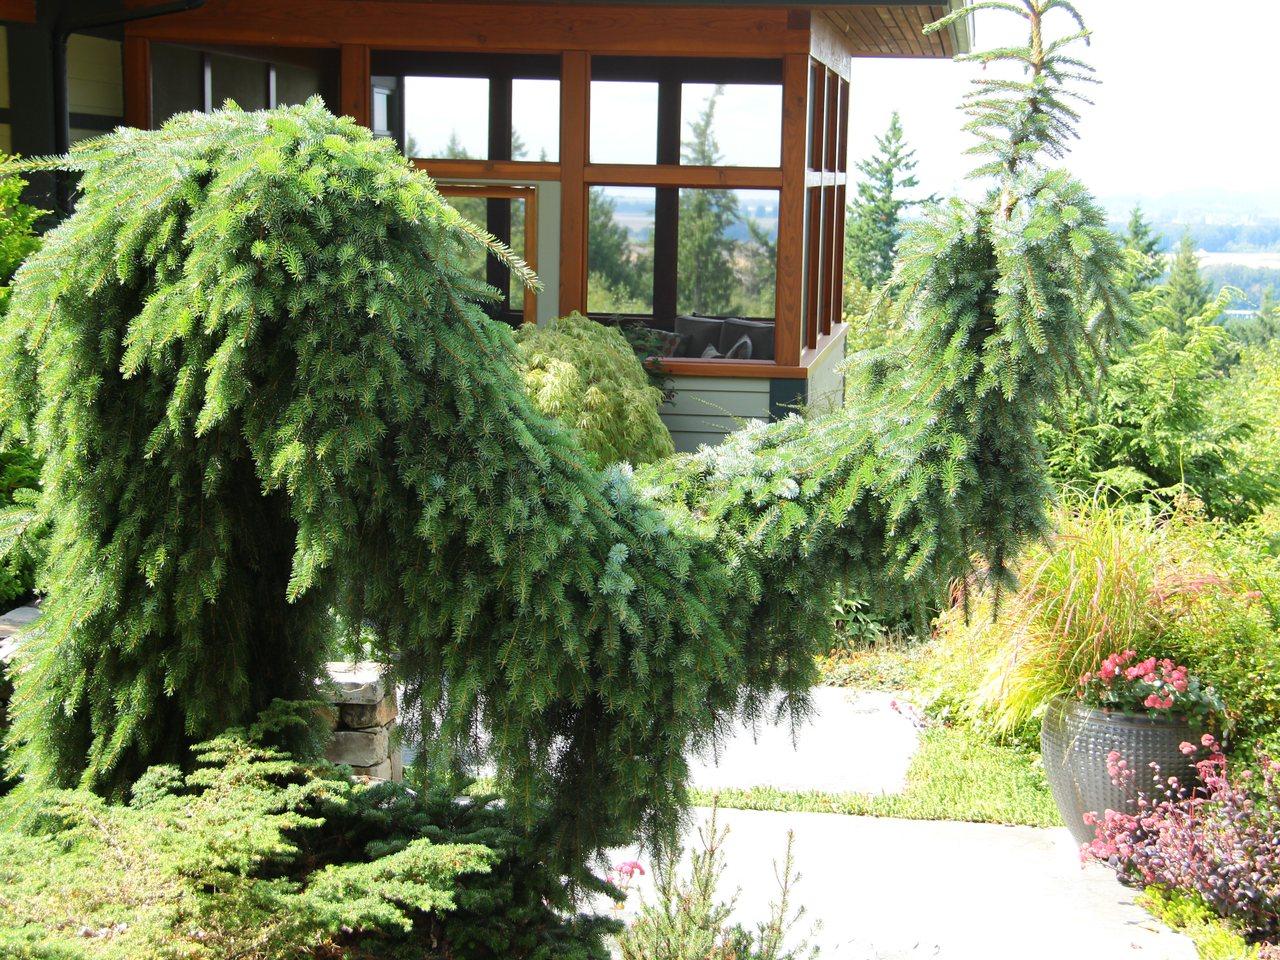 Picea omorika Pendula Bruns Serbian spruce evergreen conifer narrow upright weeping bi-colored needles